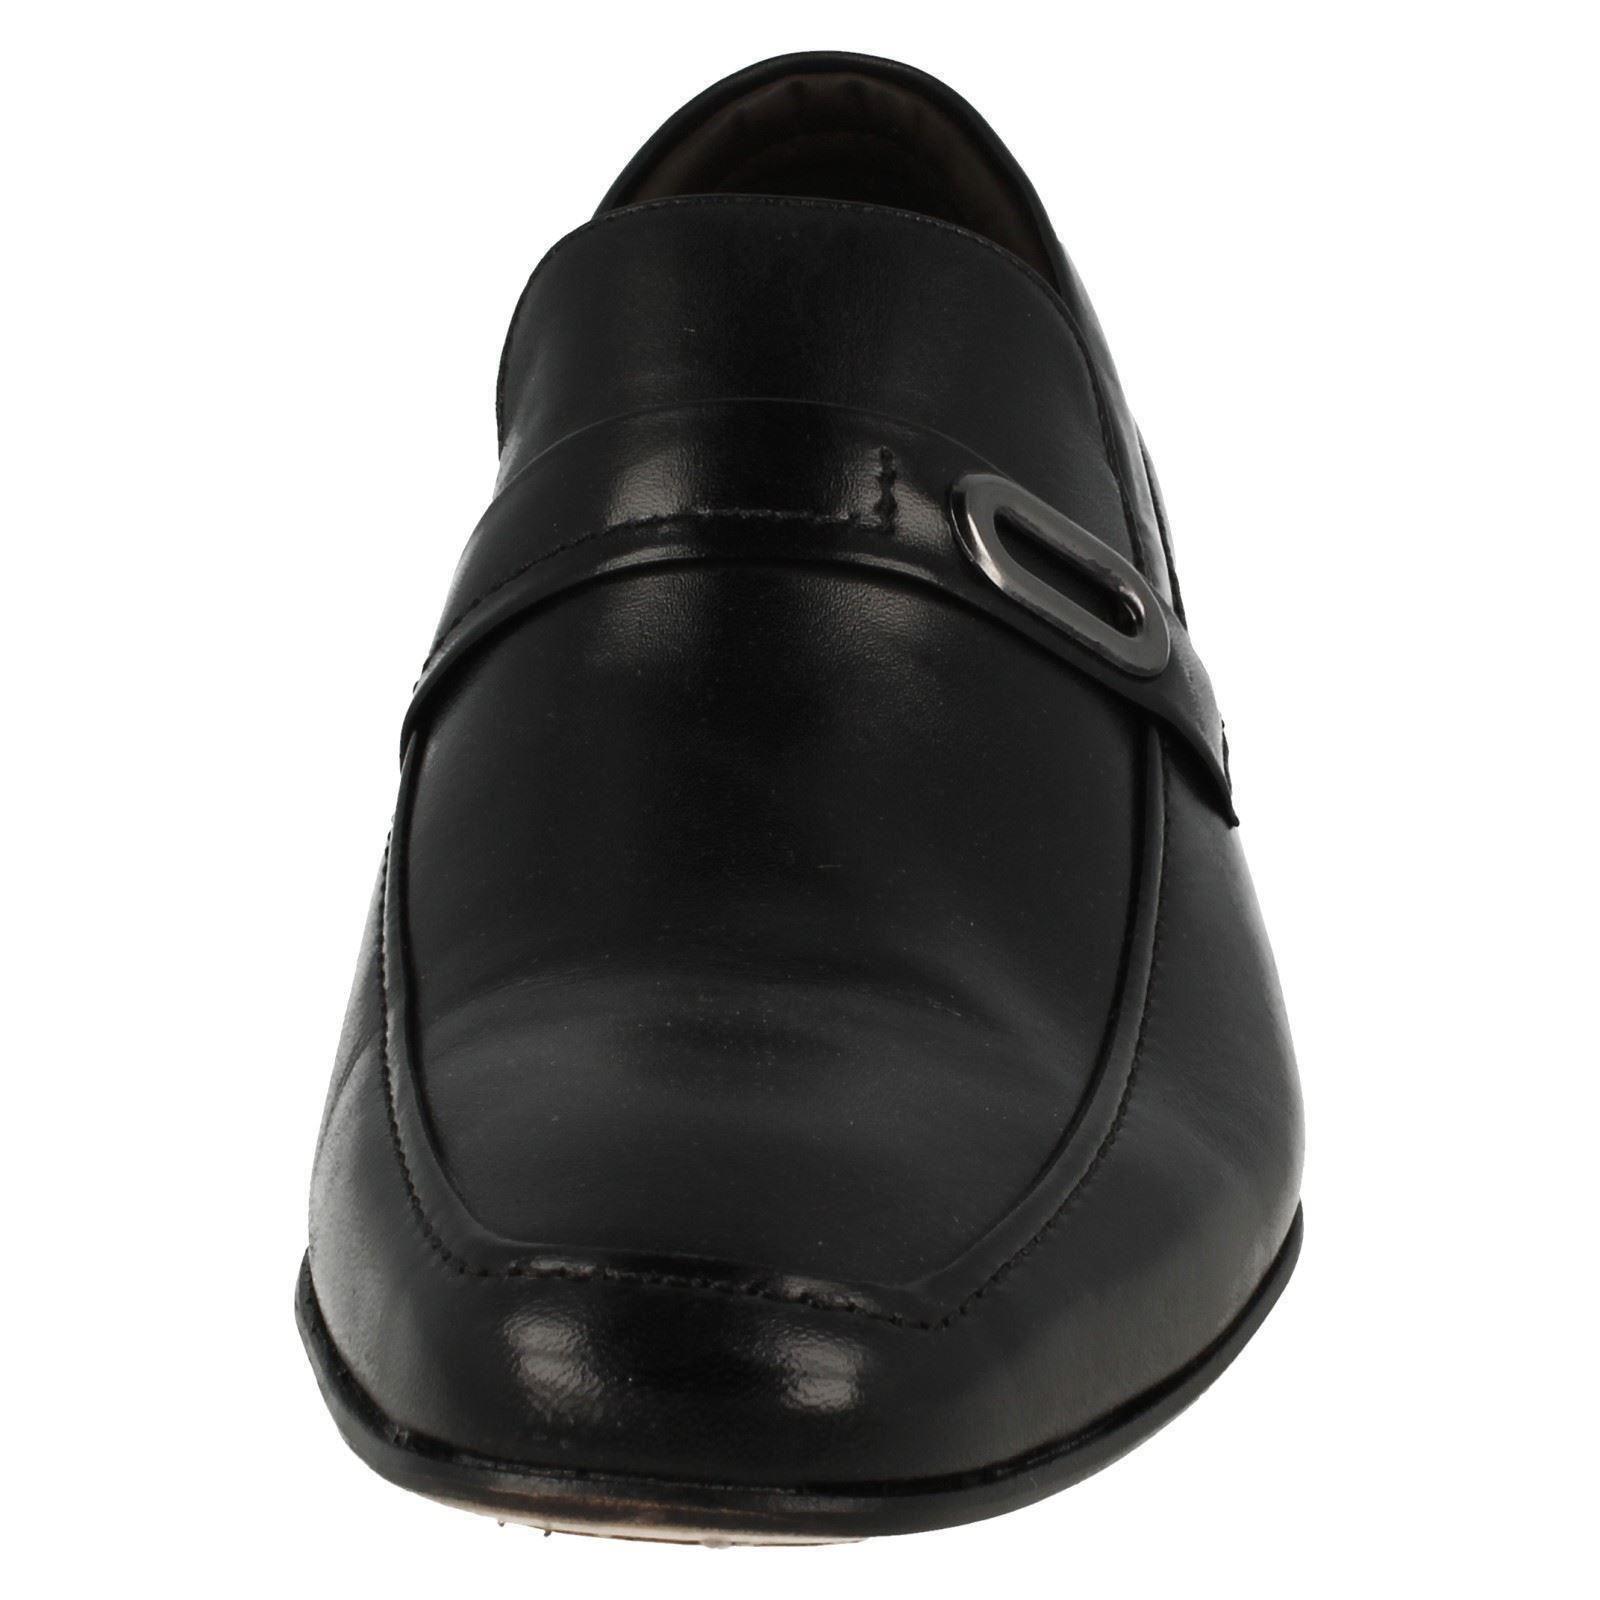 Uomo Anatomic Smart Slip 2' On Schuhes 'Sergipe 2' Slip f8ffc0